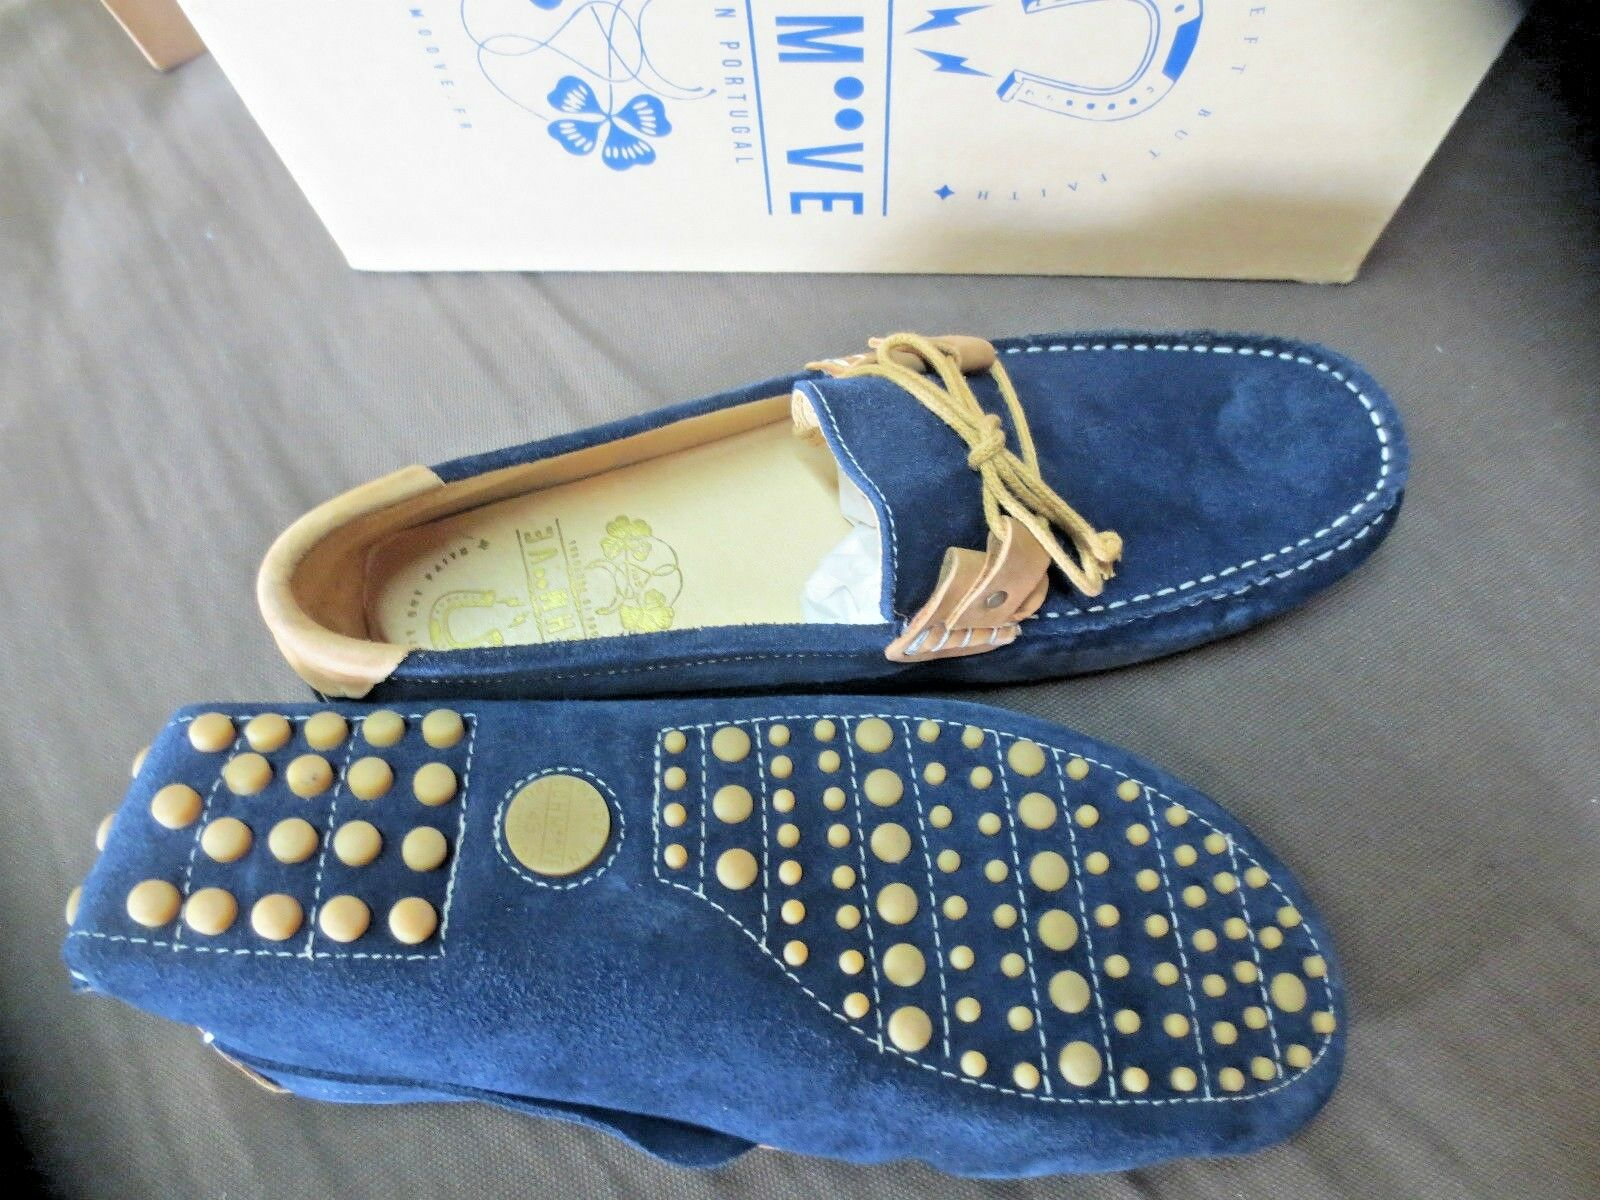 SCHMOOVE panama Wert Reef Wildleder Marineblau cuoio Wert panama 110e Schuhgrößen,43,44,45 3e5829